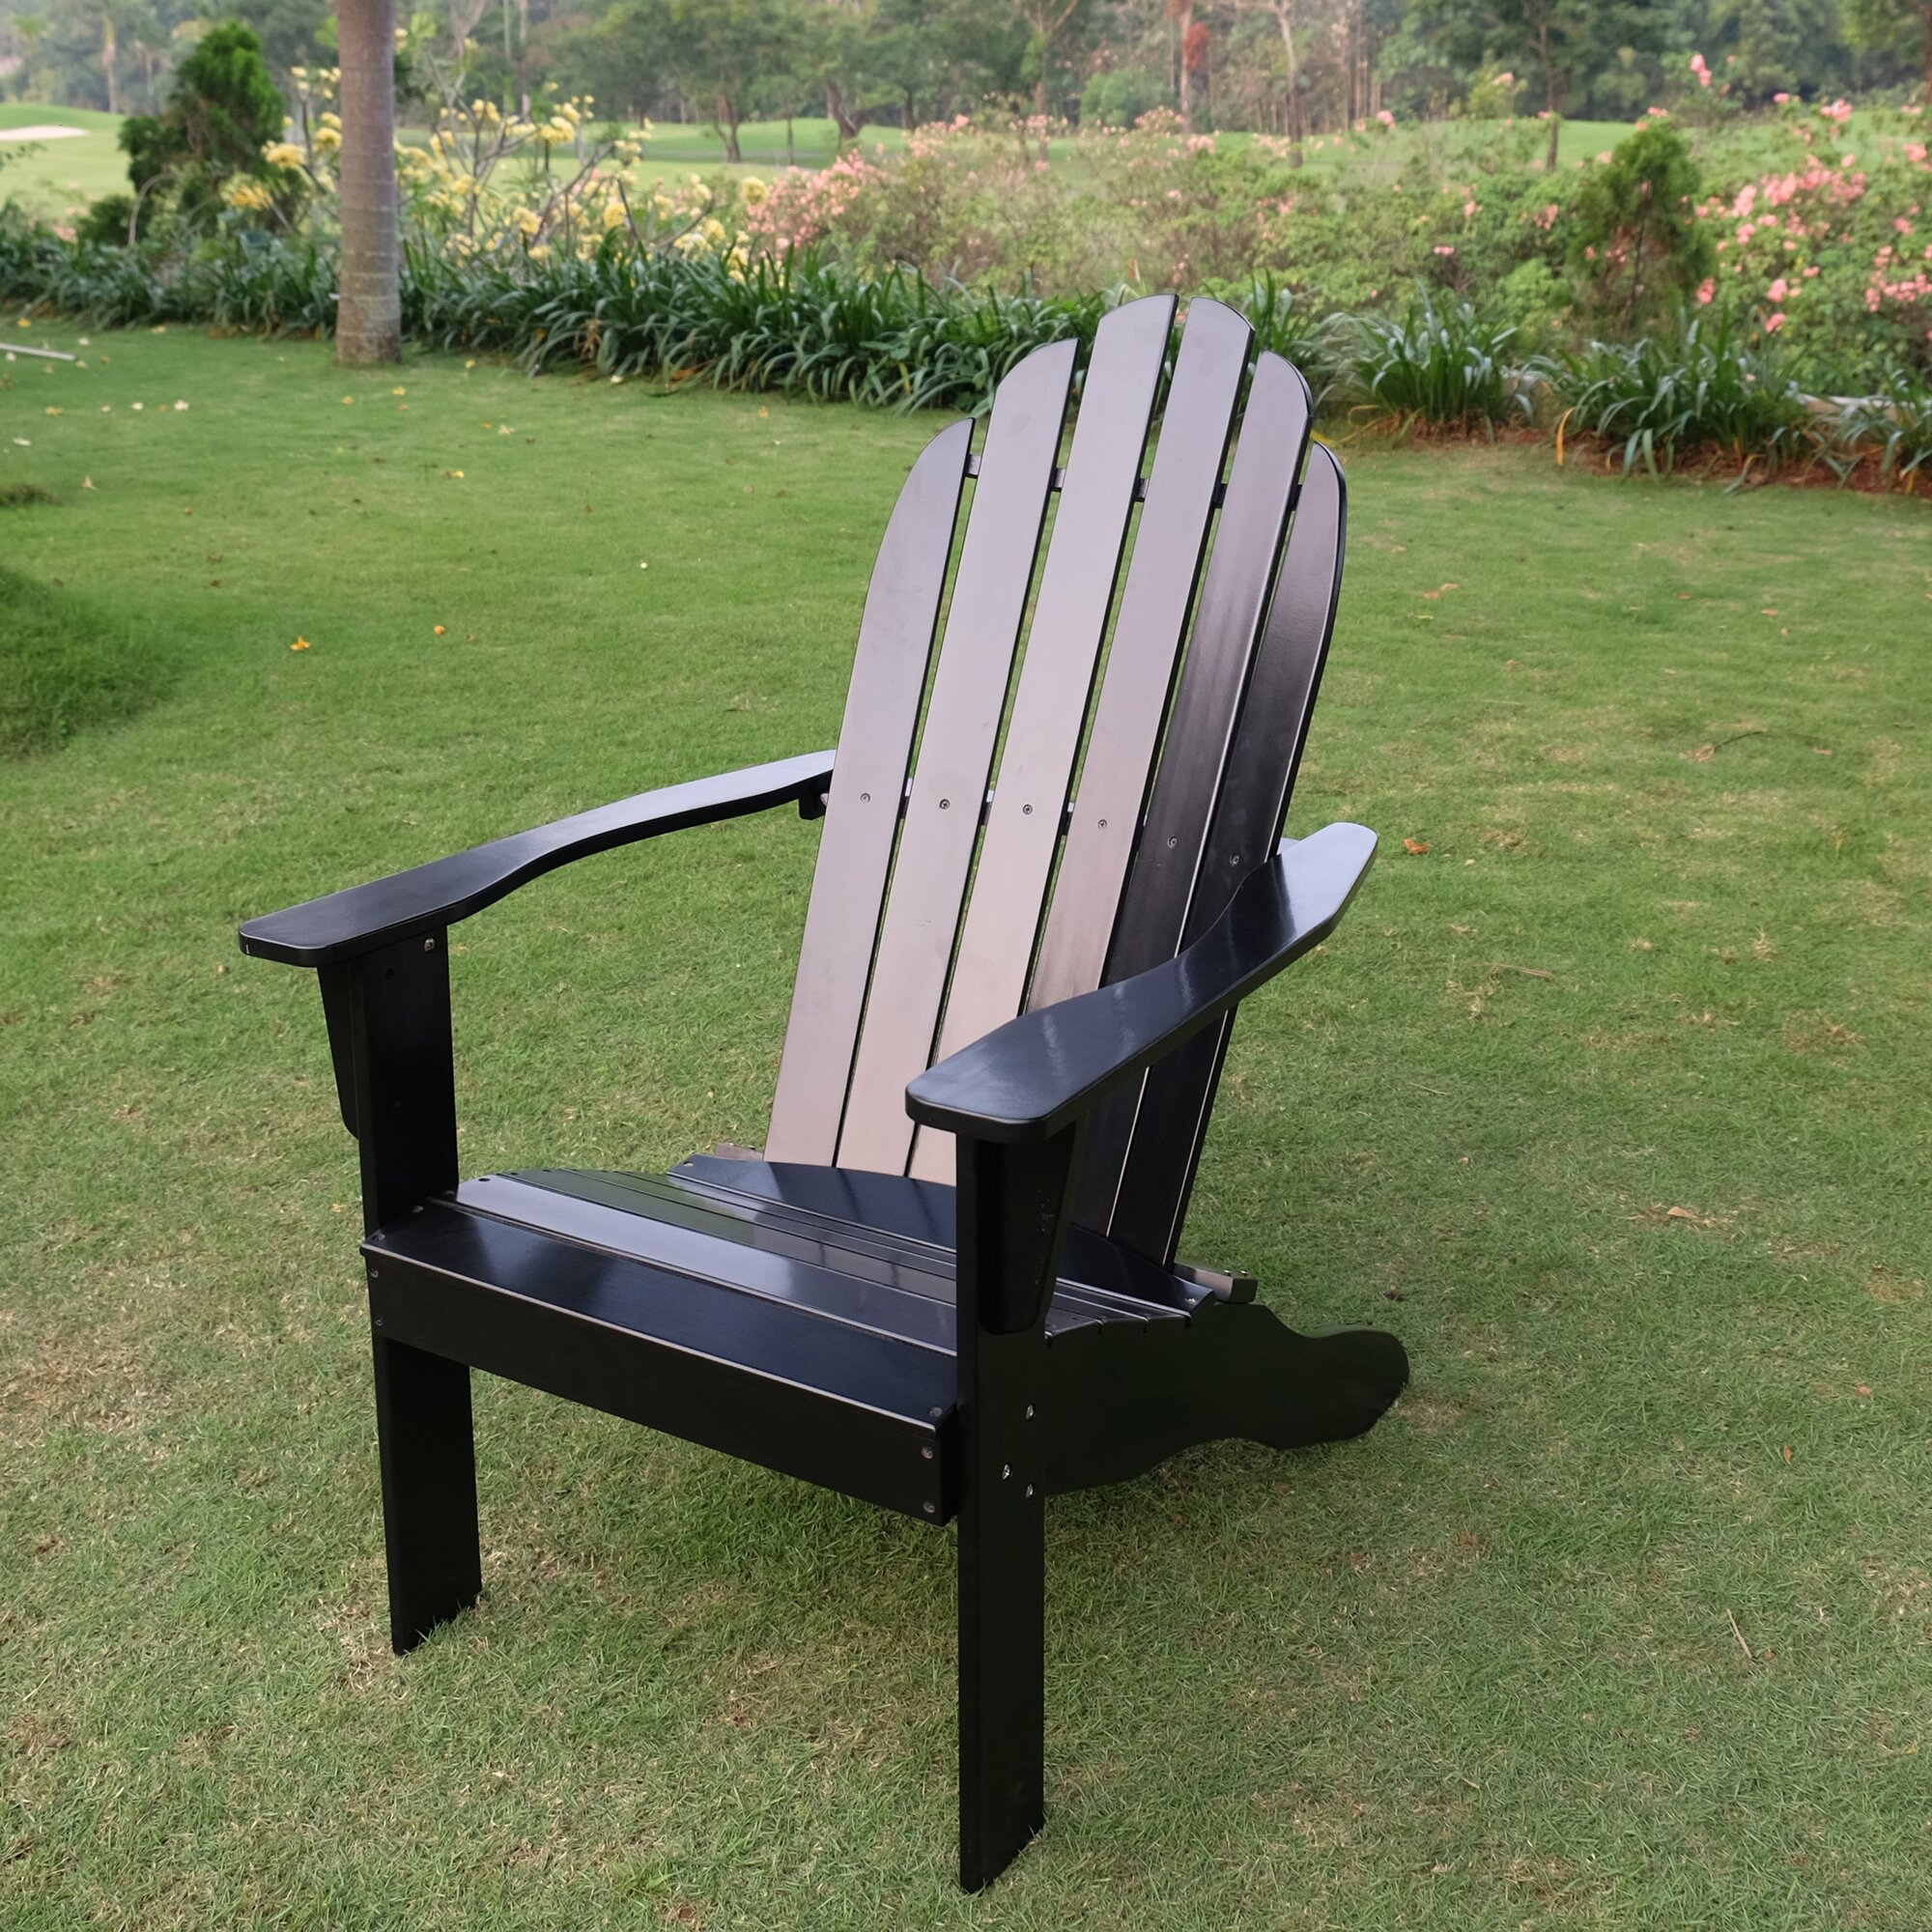 Rocking Chair Kits Instachair